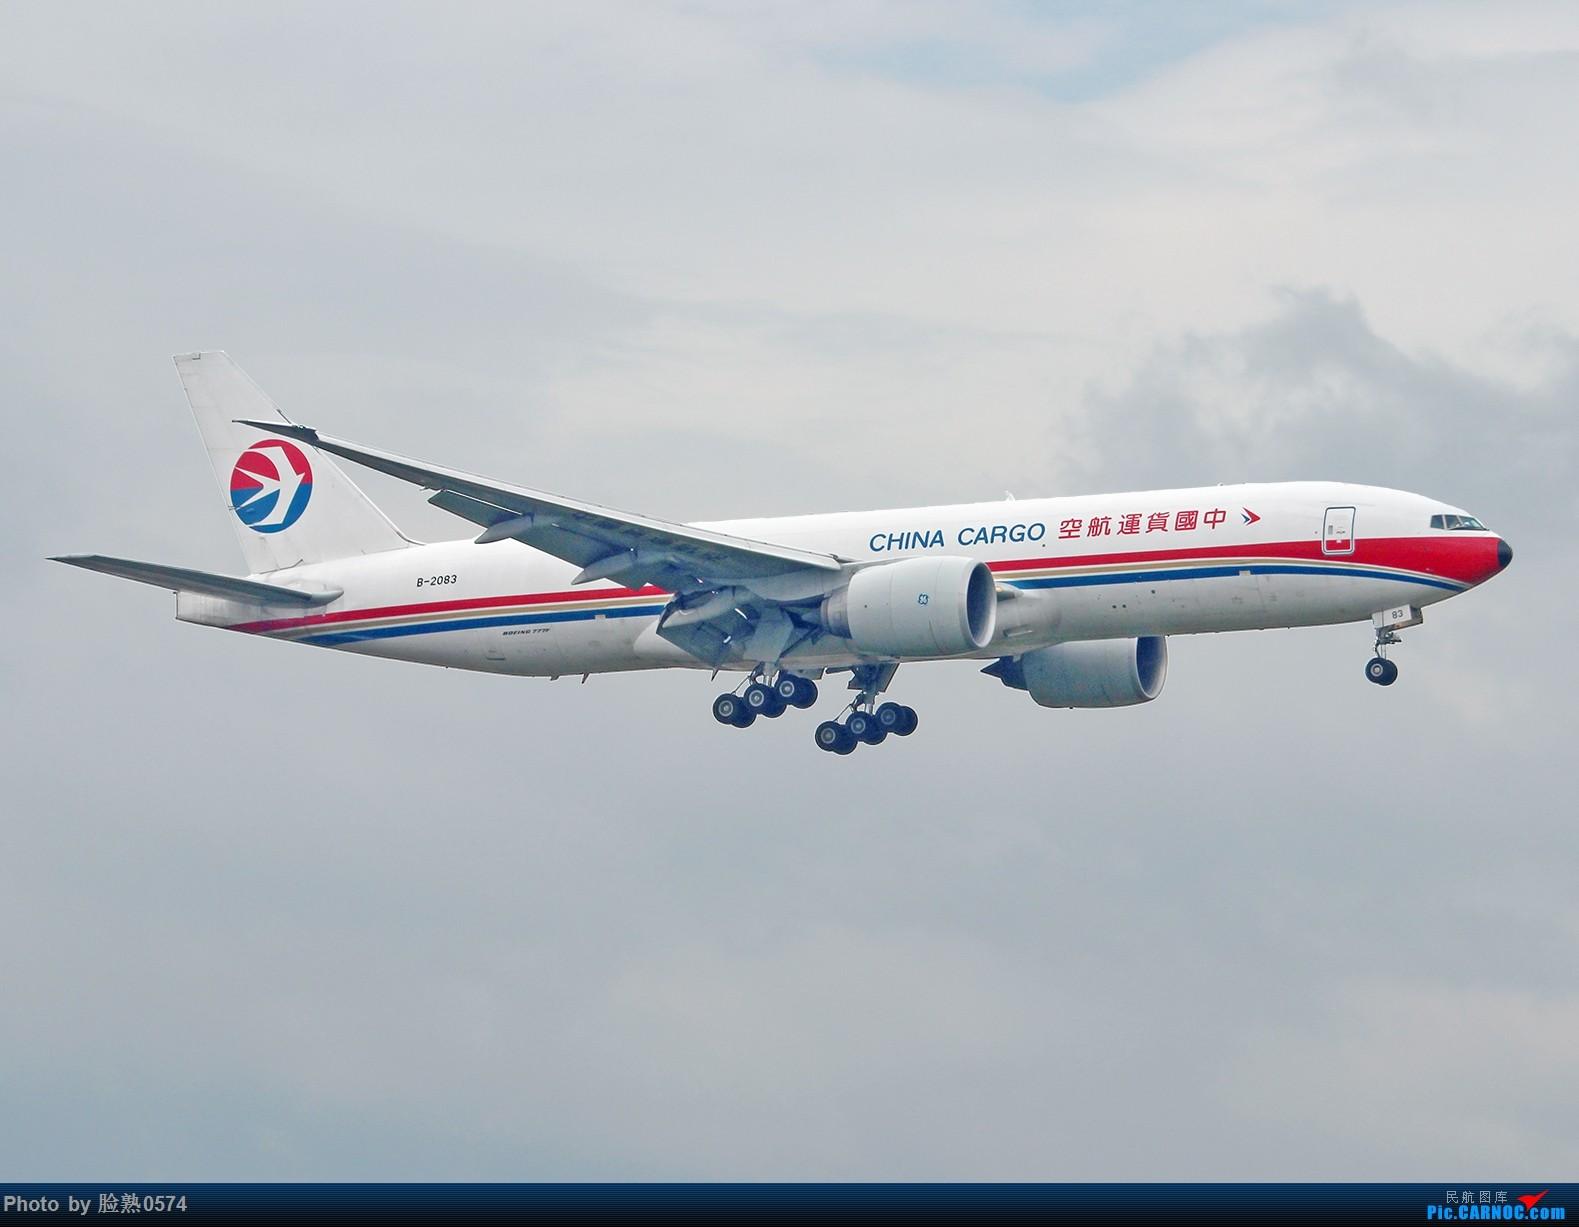 Re:[原创]NGB的777全货机 BOEING 777-200 B-2083 中国宁波栎社国际机场